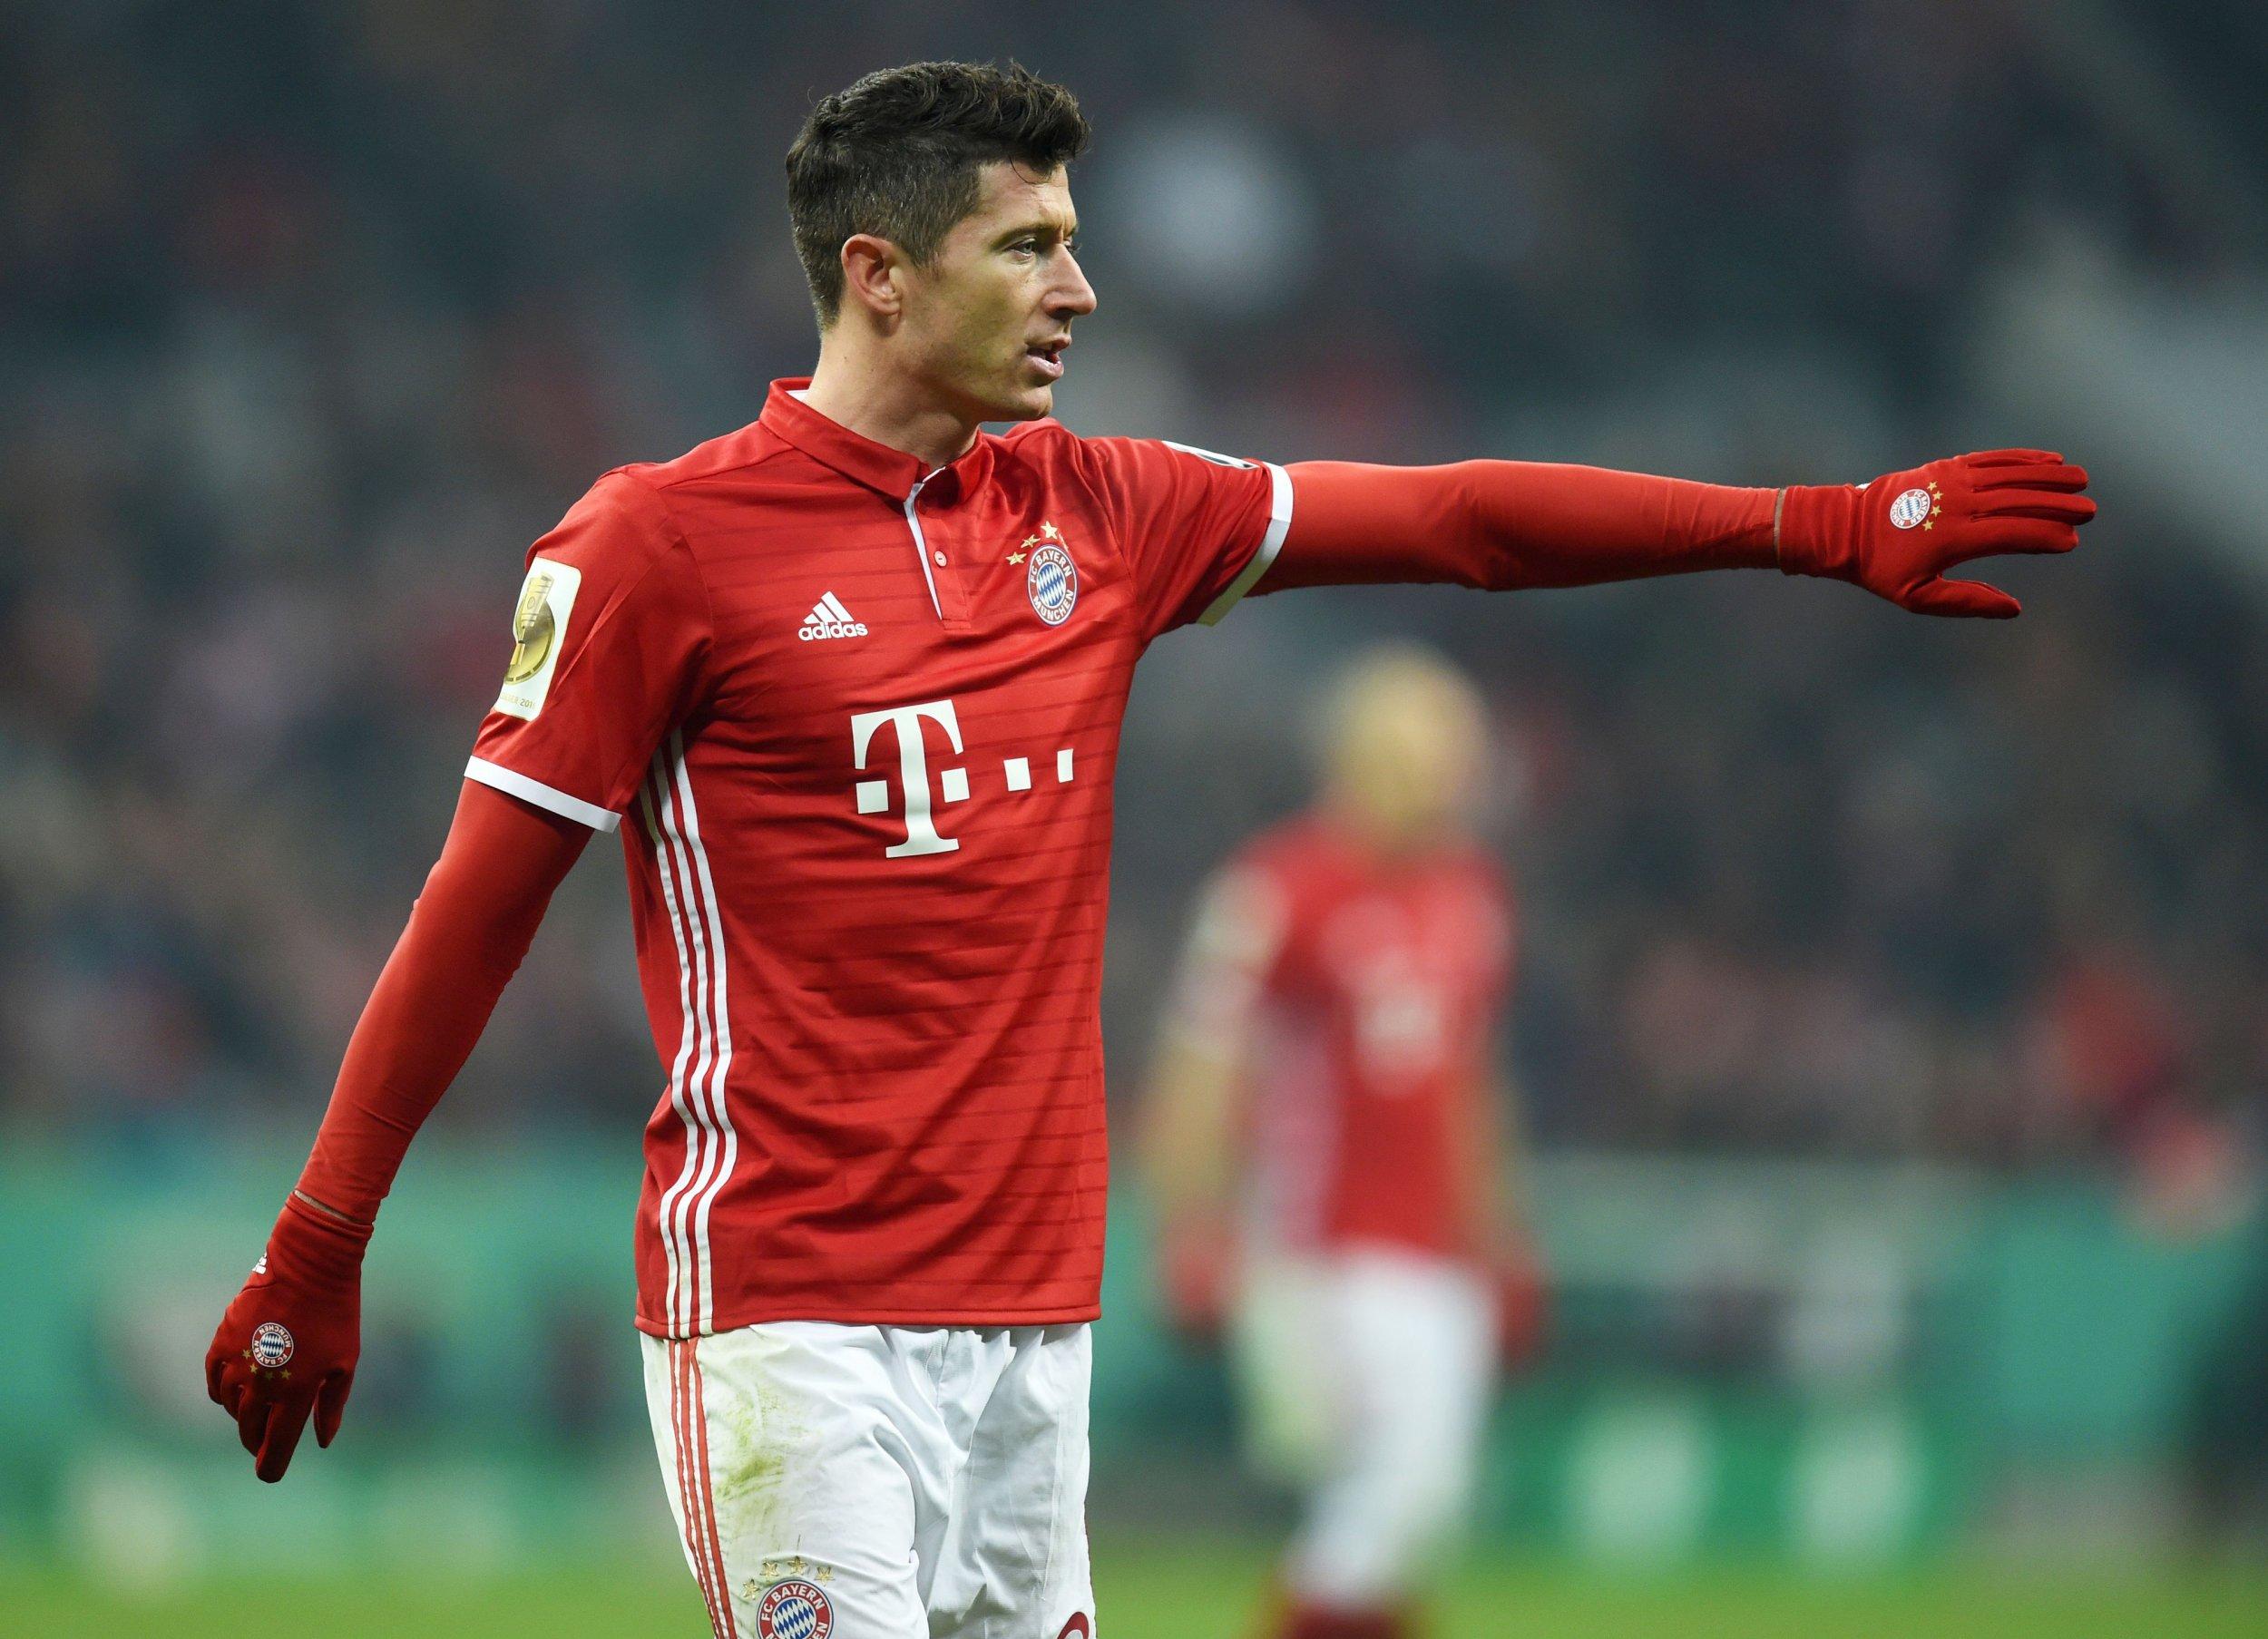 separation shoes 91221 8094d Bayern Munich Star Robert Lewandowski Warns Arsenal Ahead of ...